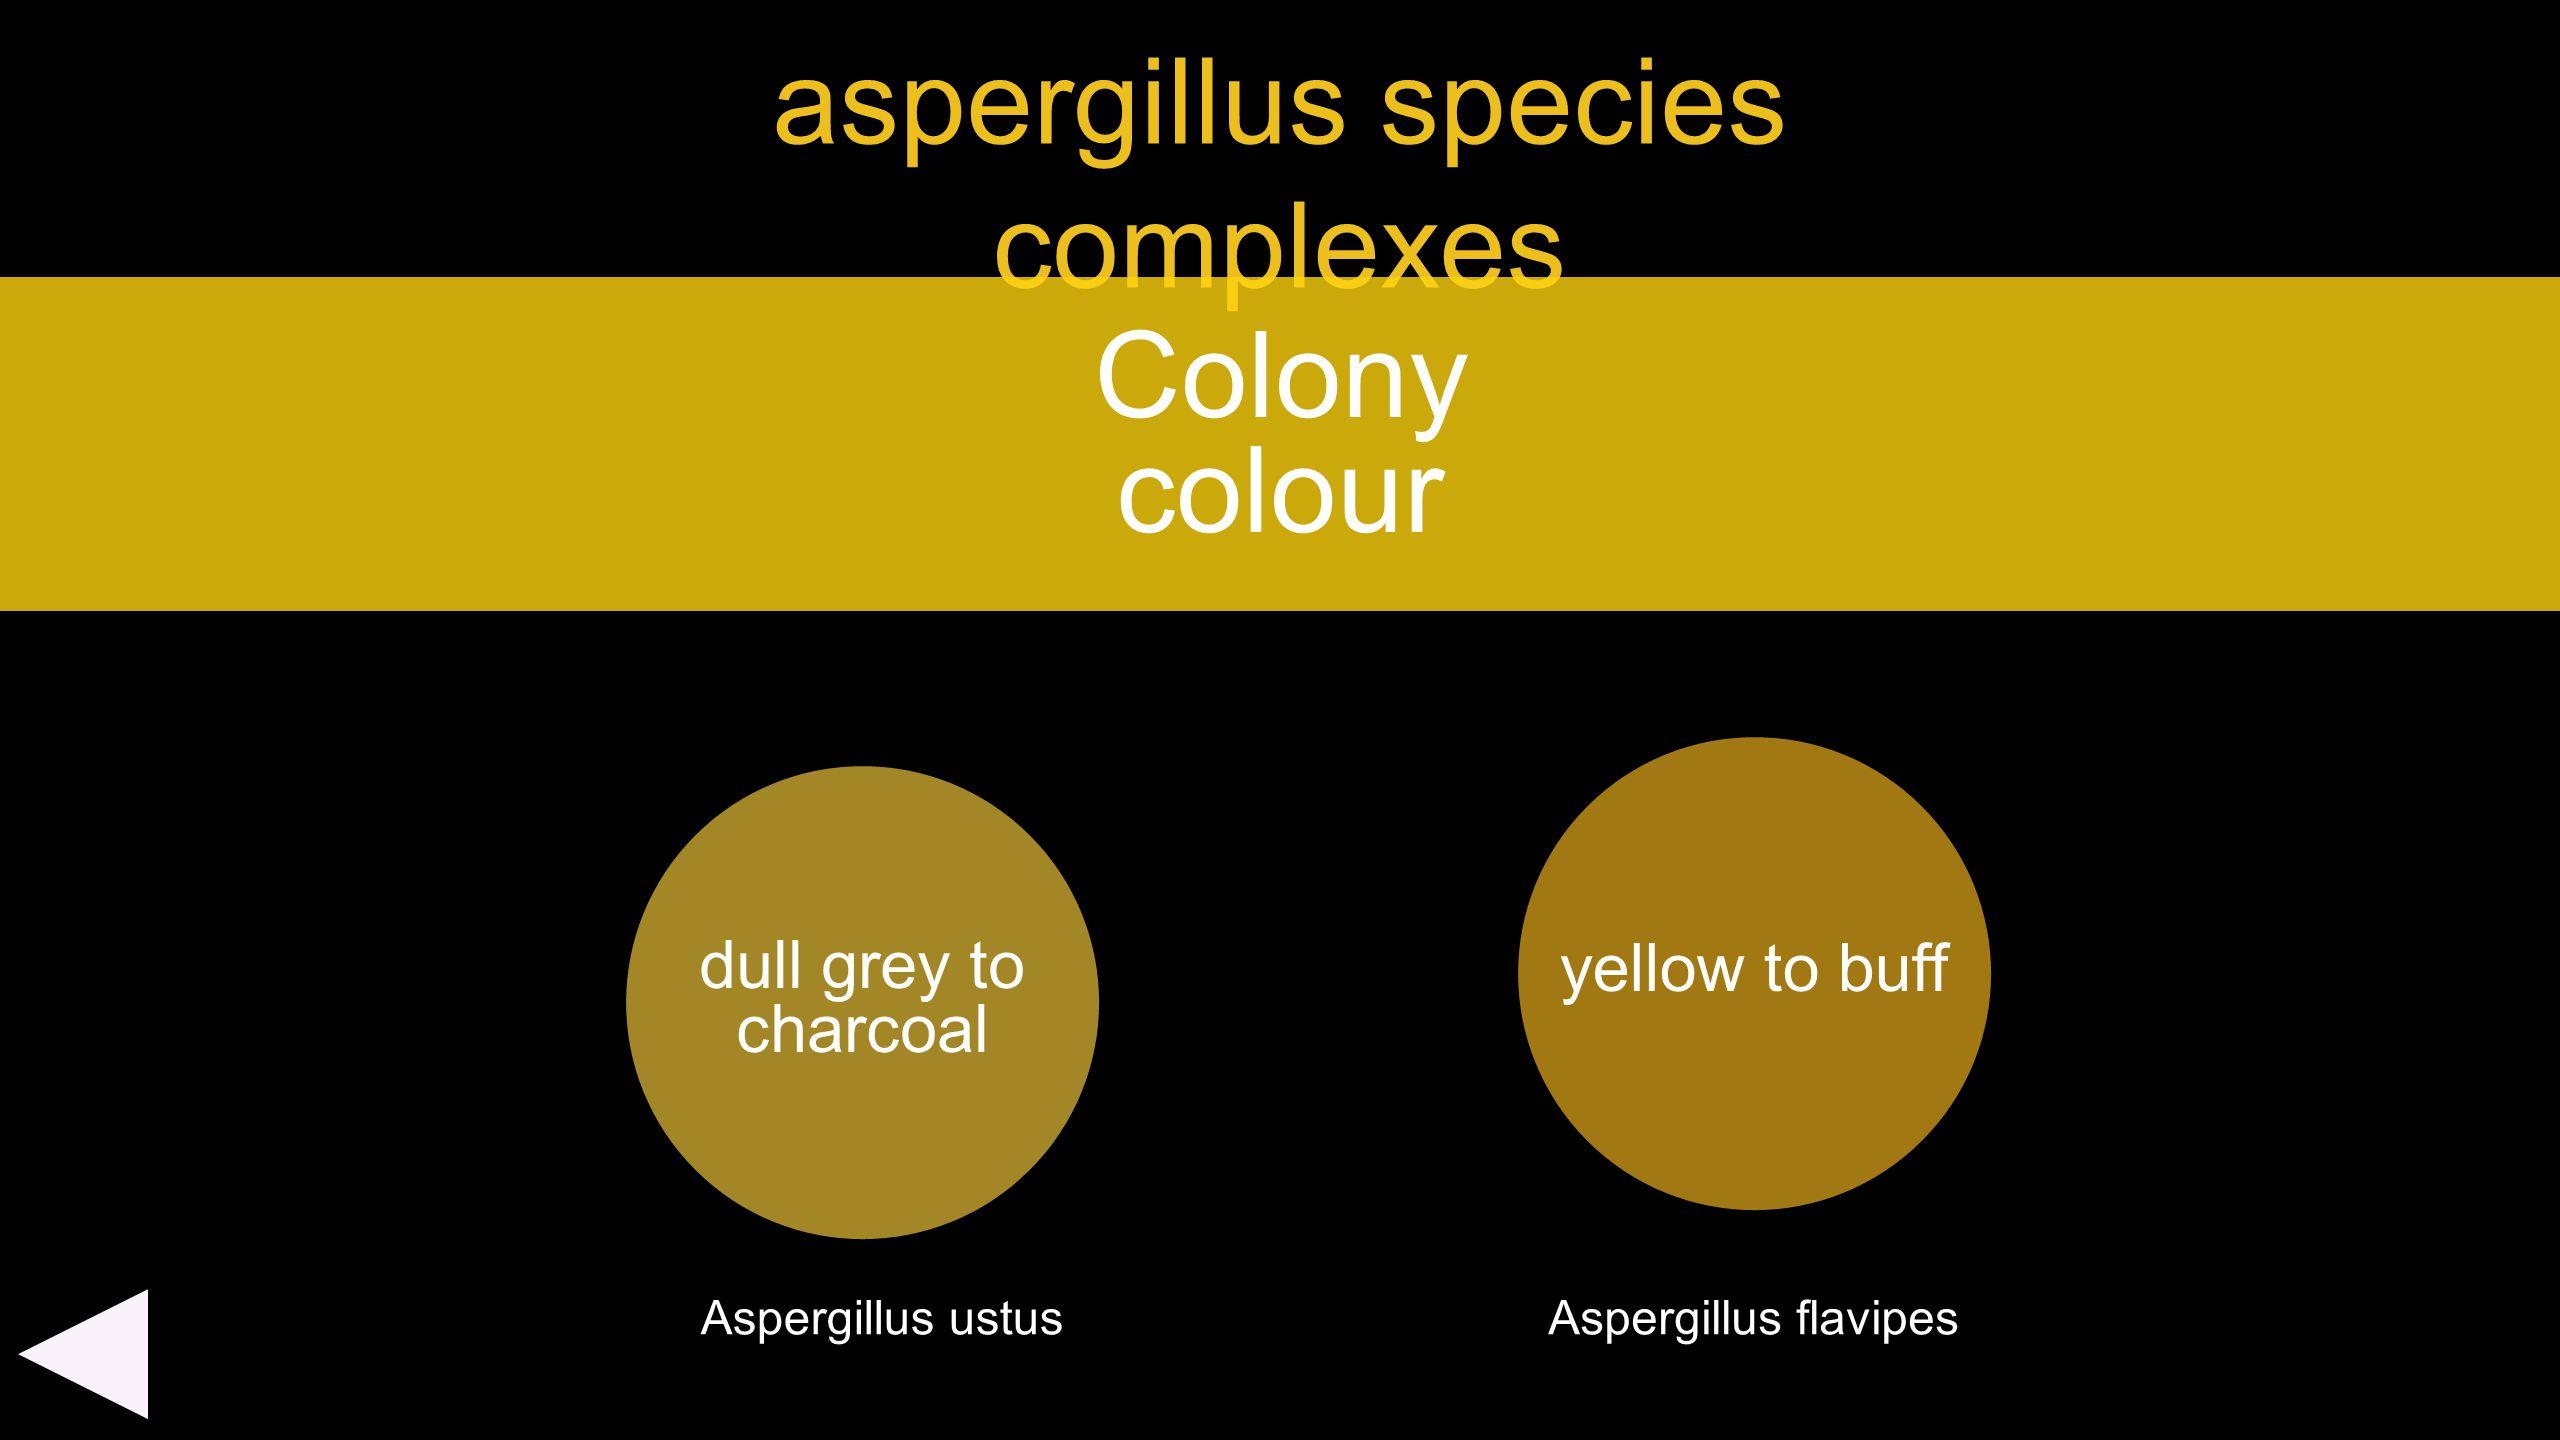 aspergillus species complexes dull grey to charcoal Colony colour yellow to buff Aspergillus ustusAspergillus flavipes